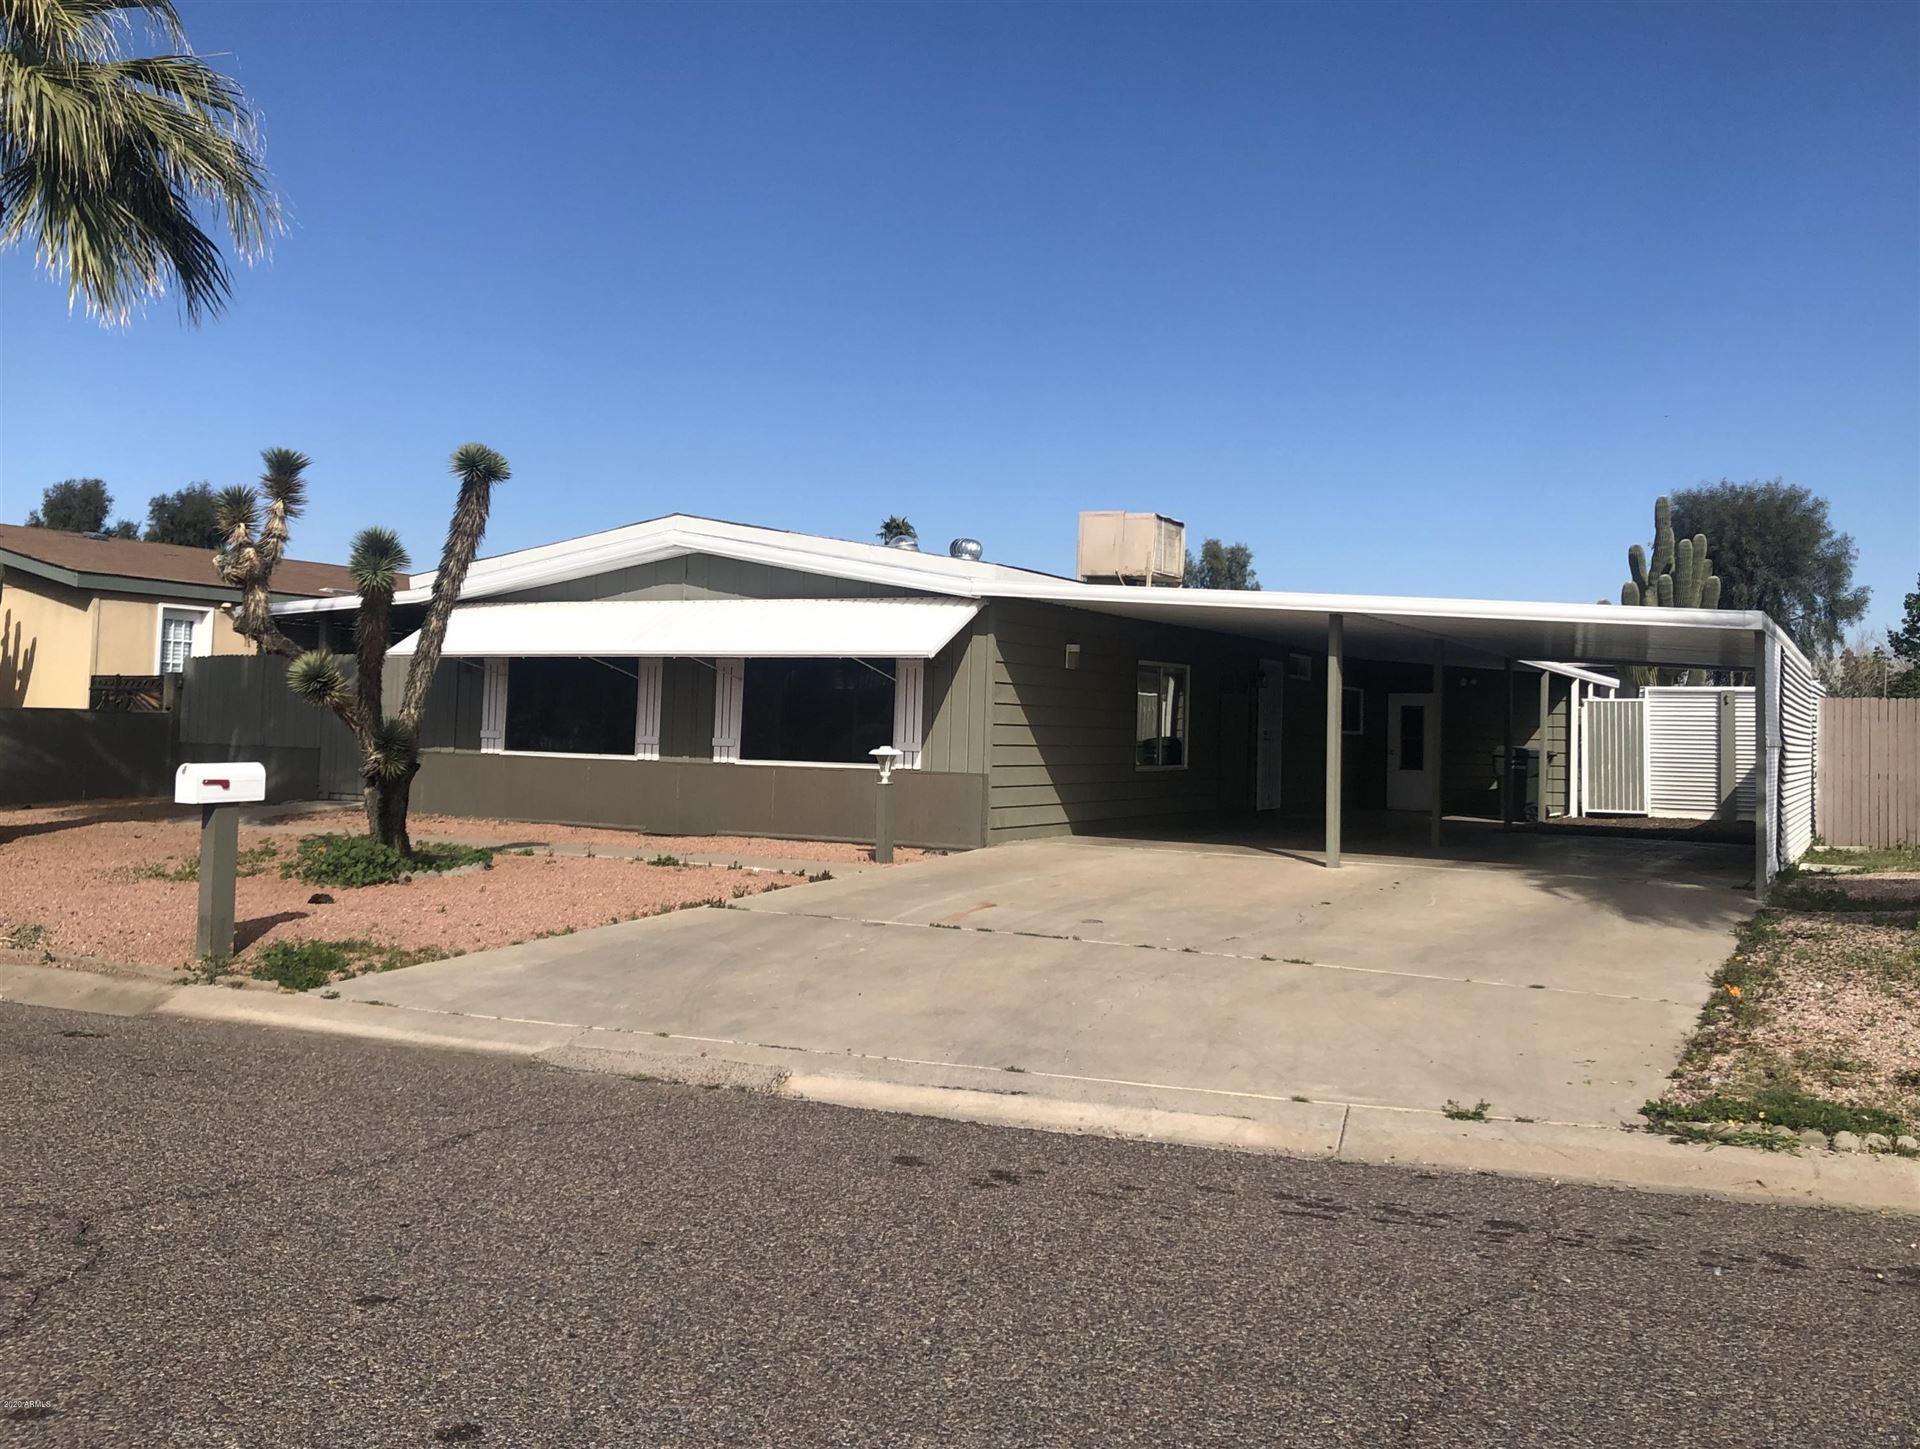 2516 E COWAN Circle, Phoenix, AZ 85050 - #: 6040114